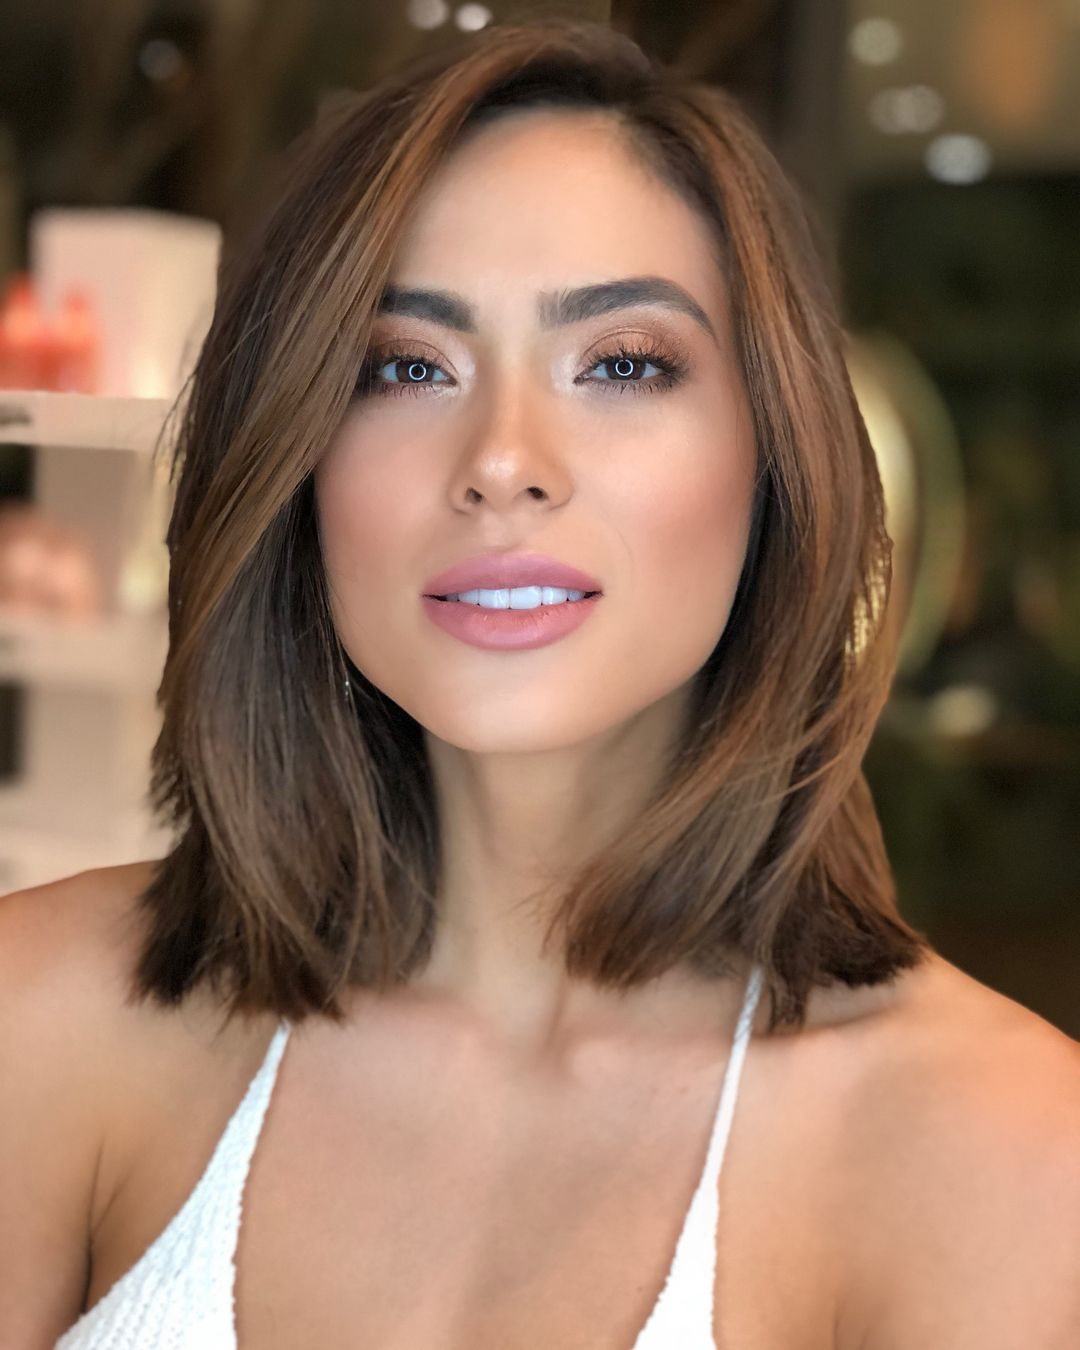 Pin On Beauty Hair Fashion Yoga Fitness